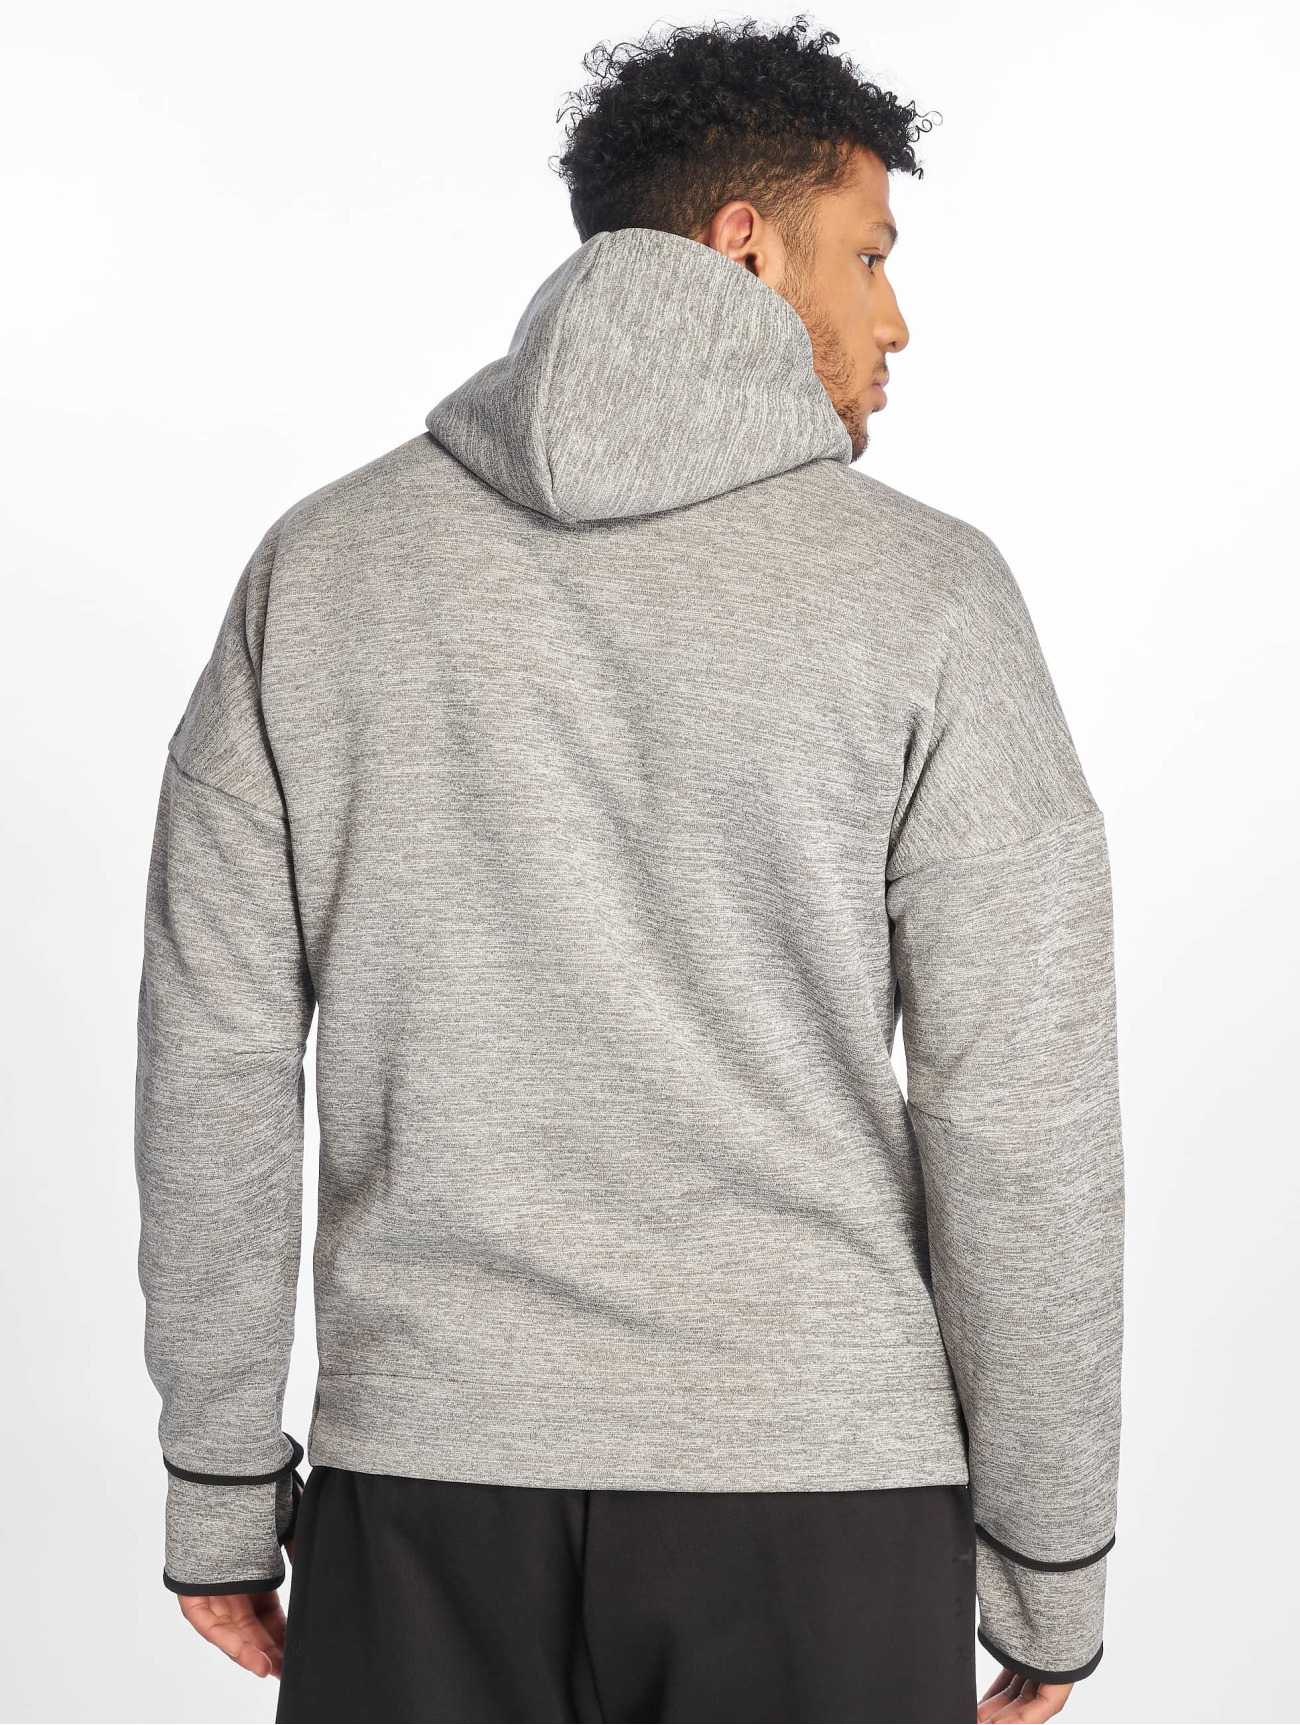 adidas Performance Överdel / Zip Hoodie ZNE i grå 617871 Män Överdelar